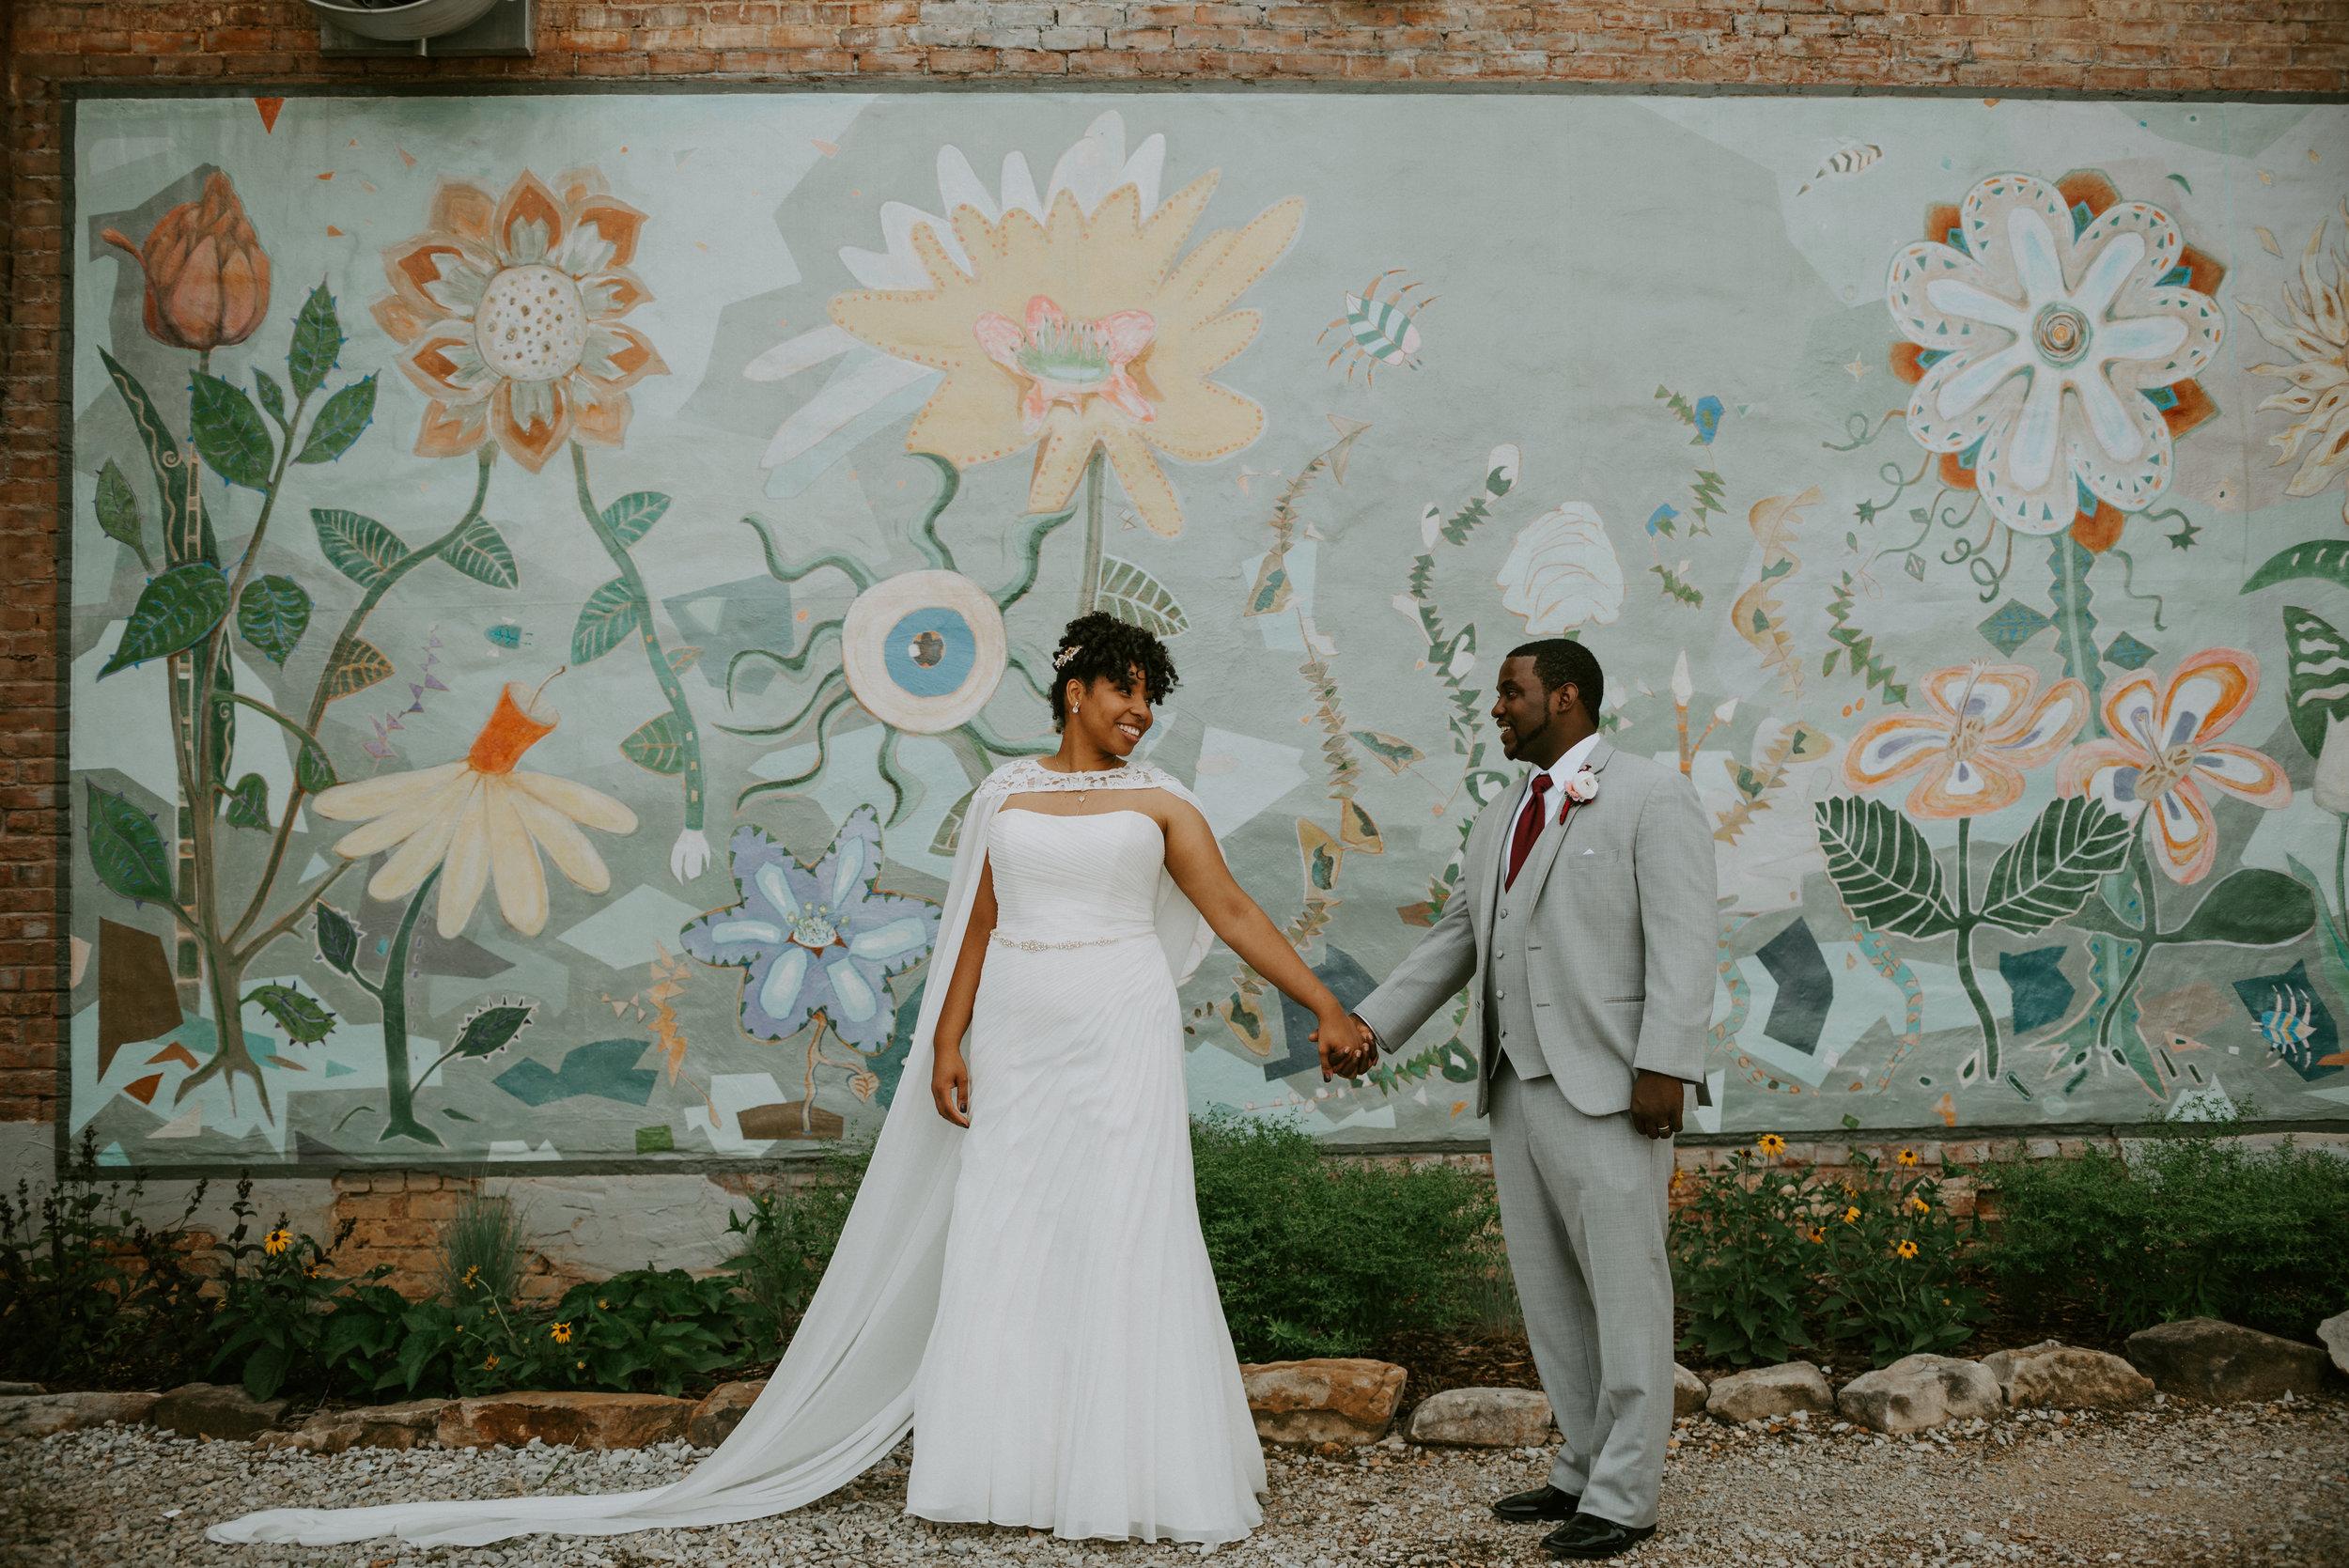 WonderlyCreative_Wedding_6.7.18_Khara&Dwayne_-736.jpg